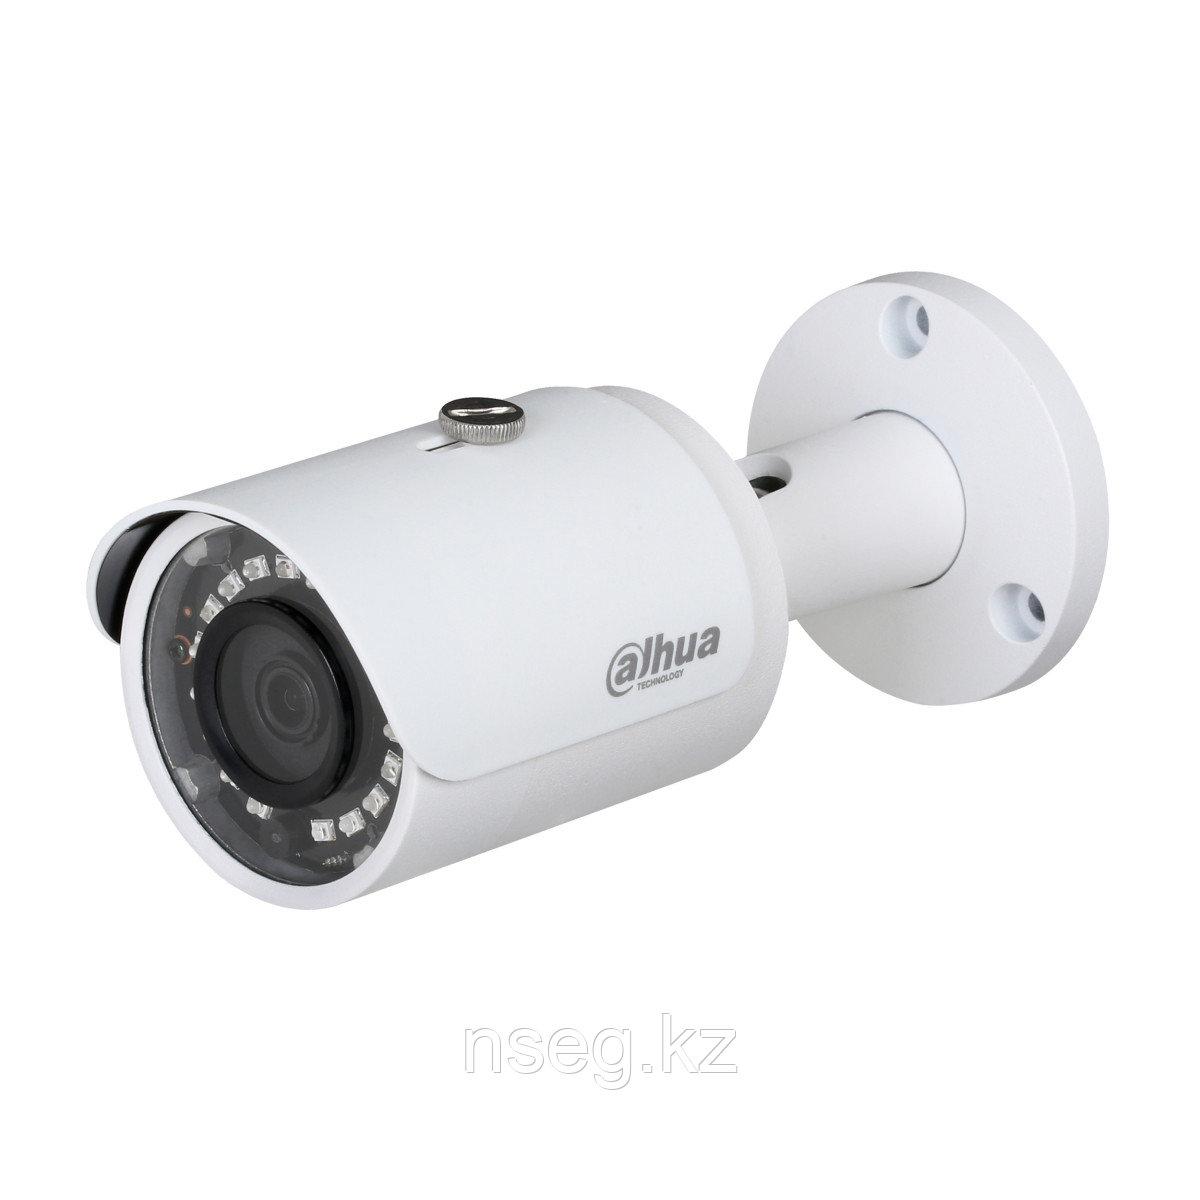 2 МП IP видеокамера Dahua IPC-HFW1220S-S3